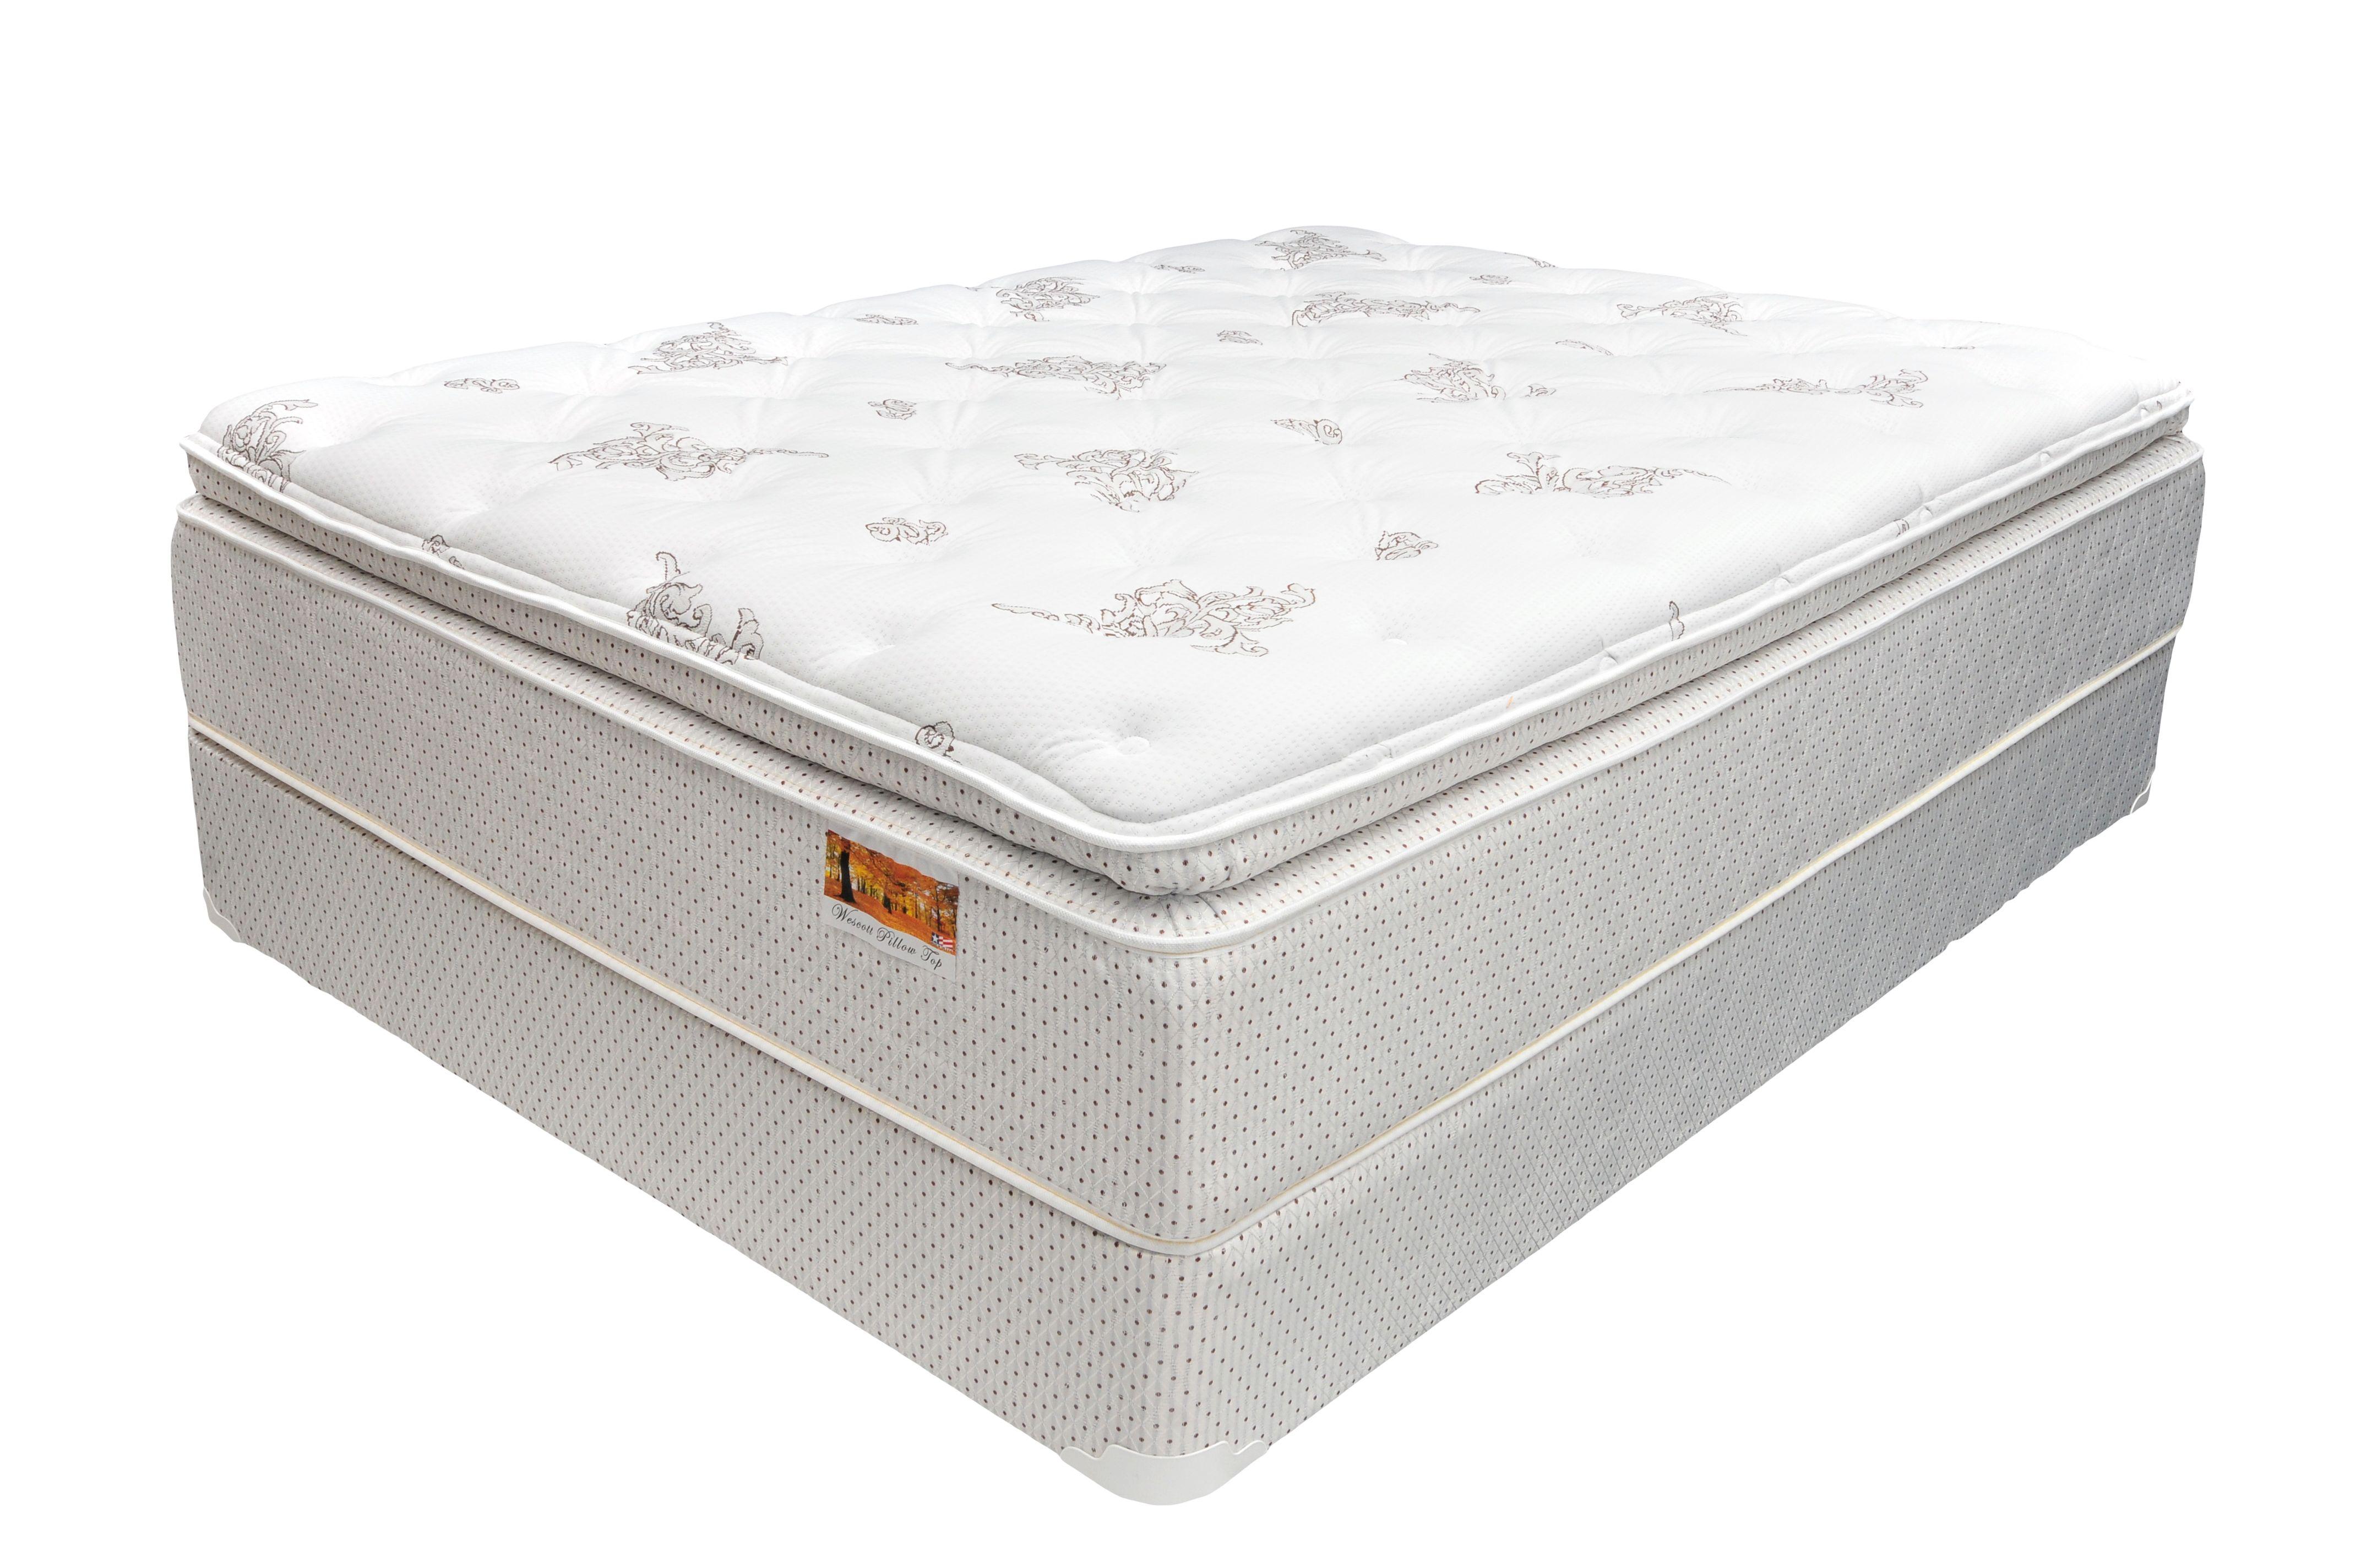 Buy Corsicana Bedding Marden Pillow Top Queen Mattress Set